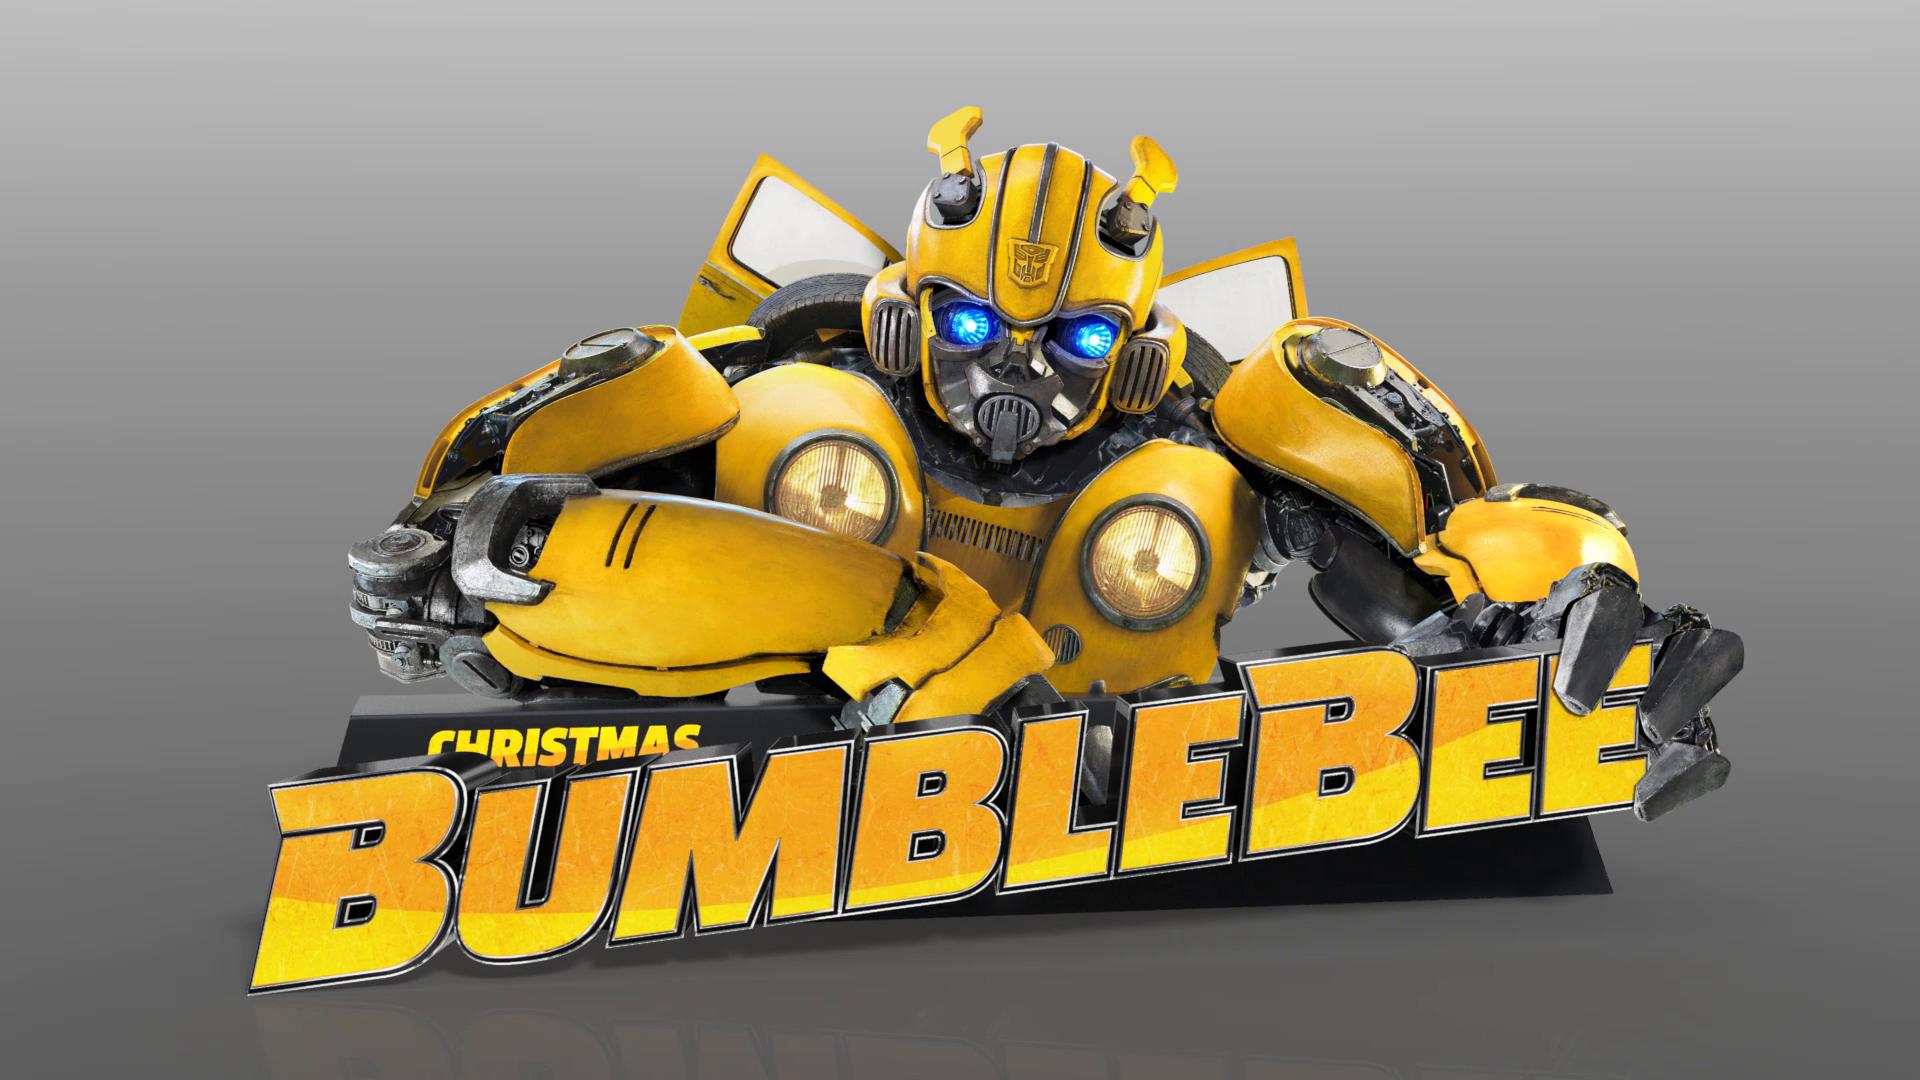 Thumbnail for Bumblebee Standee with Custom Animated AV Eyes